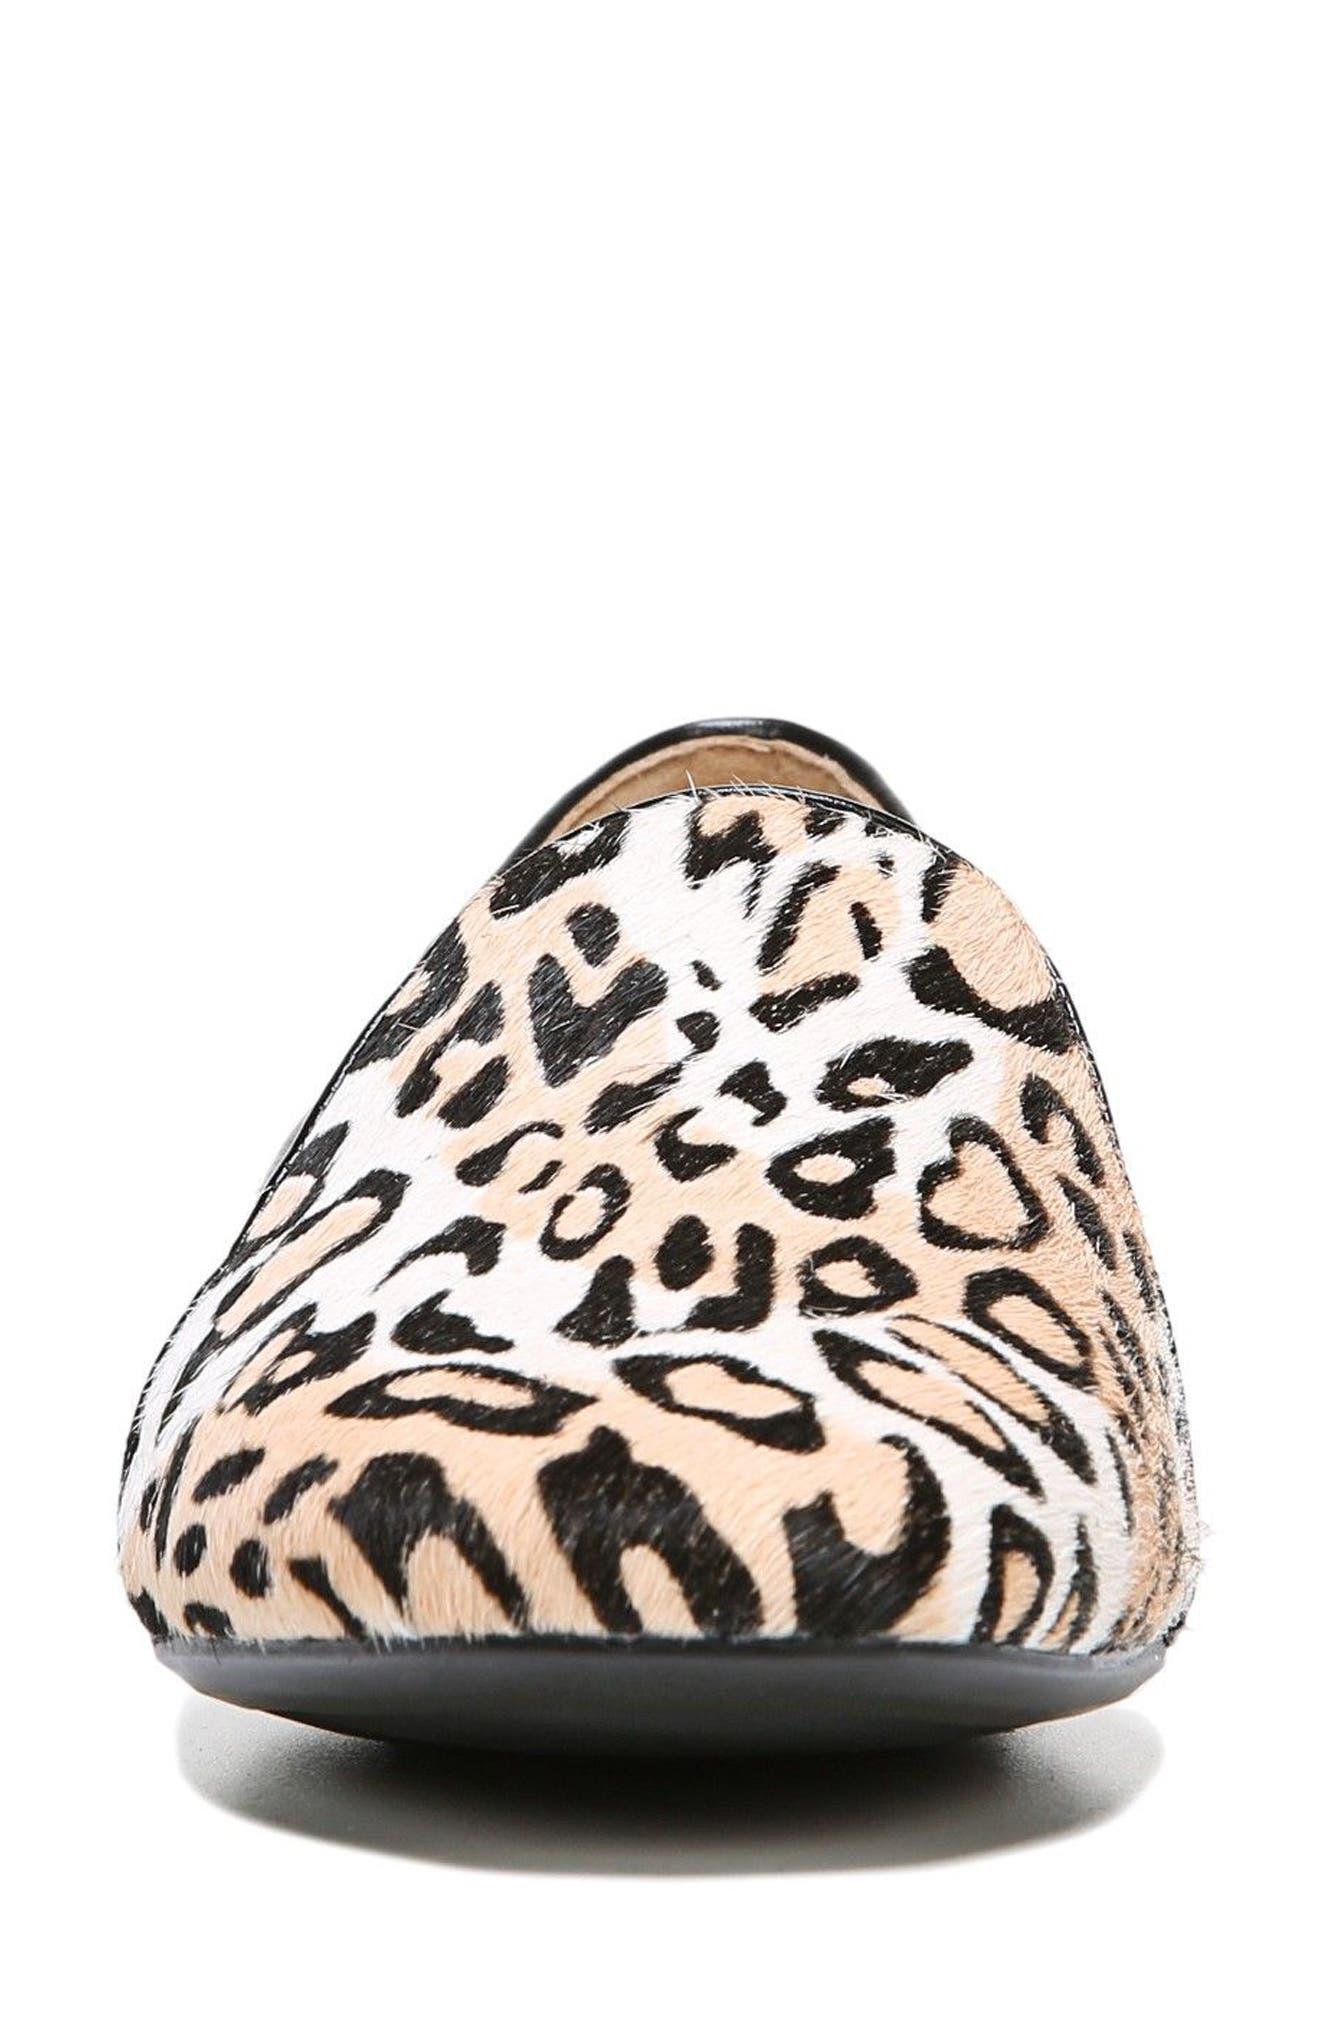 Emiline 2 Loafer,                             Alternate thumbnail 4, color,                             Cheetah Brahma Hair